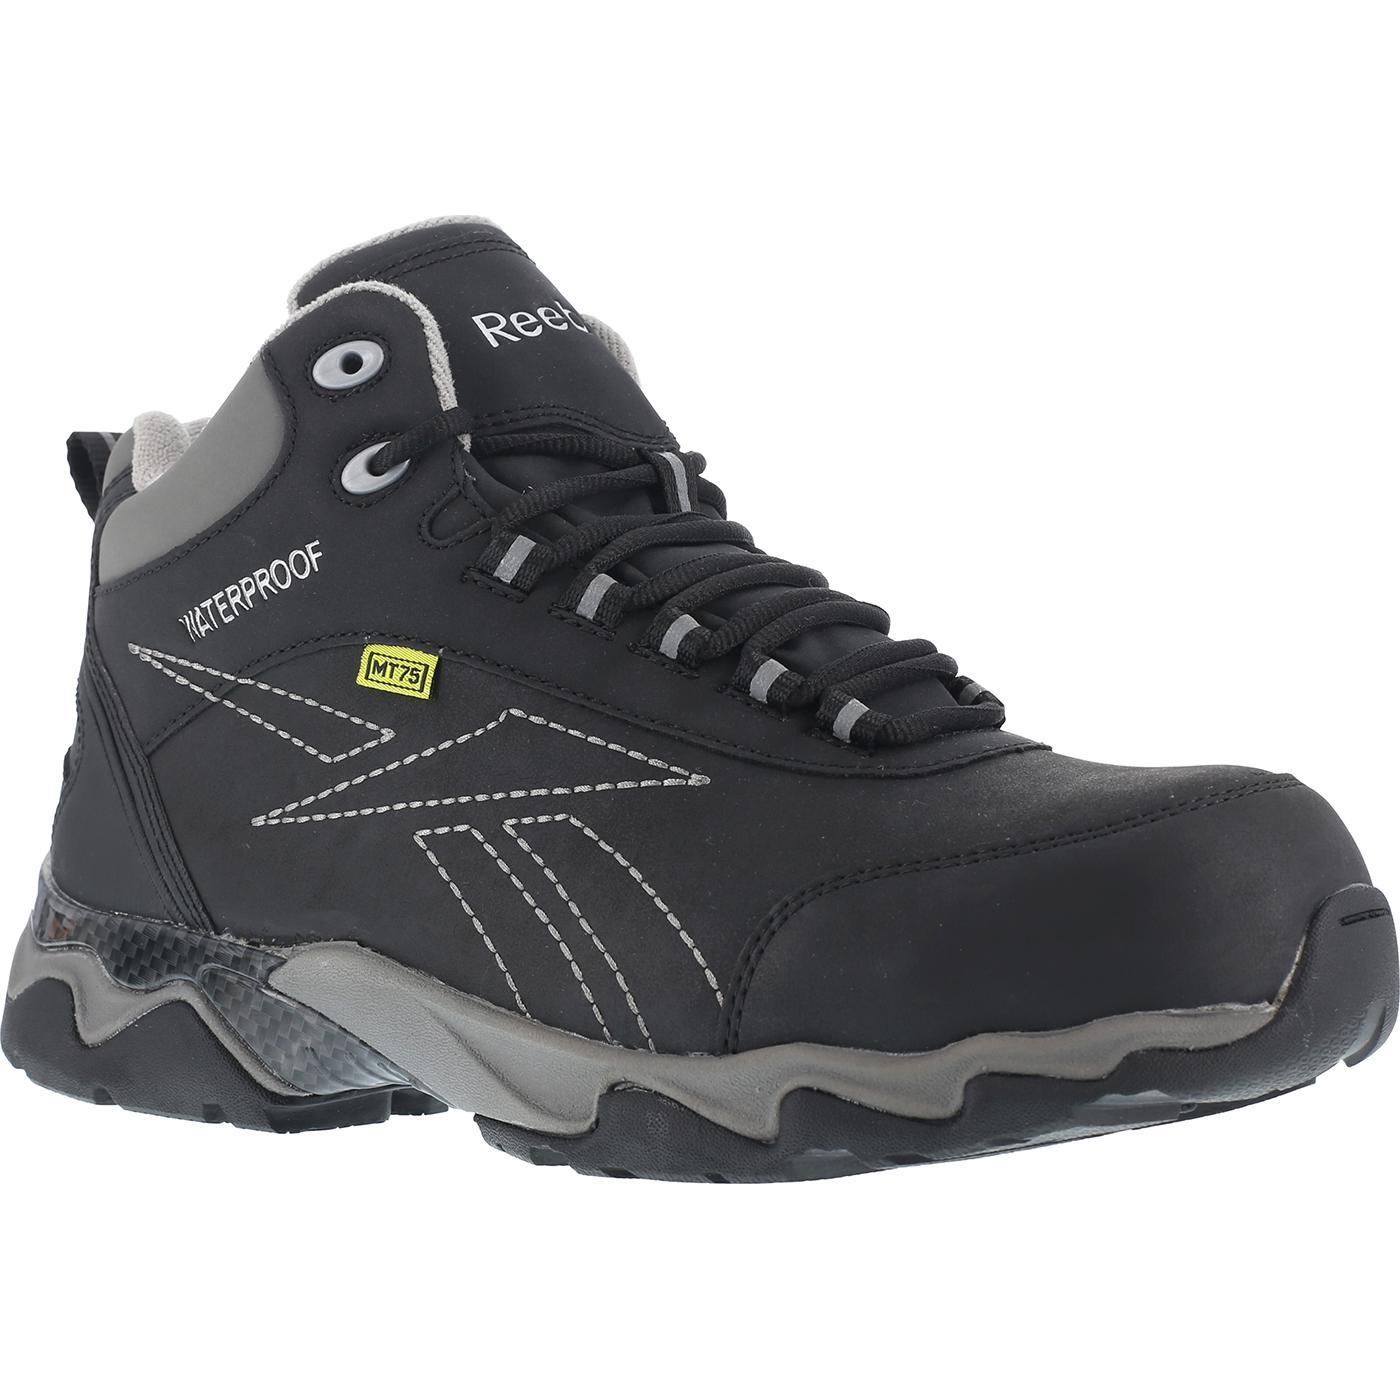 49d4e8614daeb Reebok Beamer Women's Composite Toe Internal Met Guard Waterproof Work Hiker